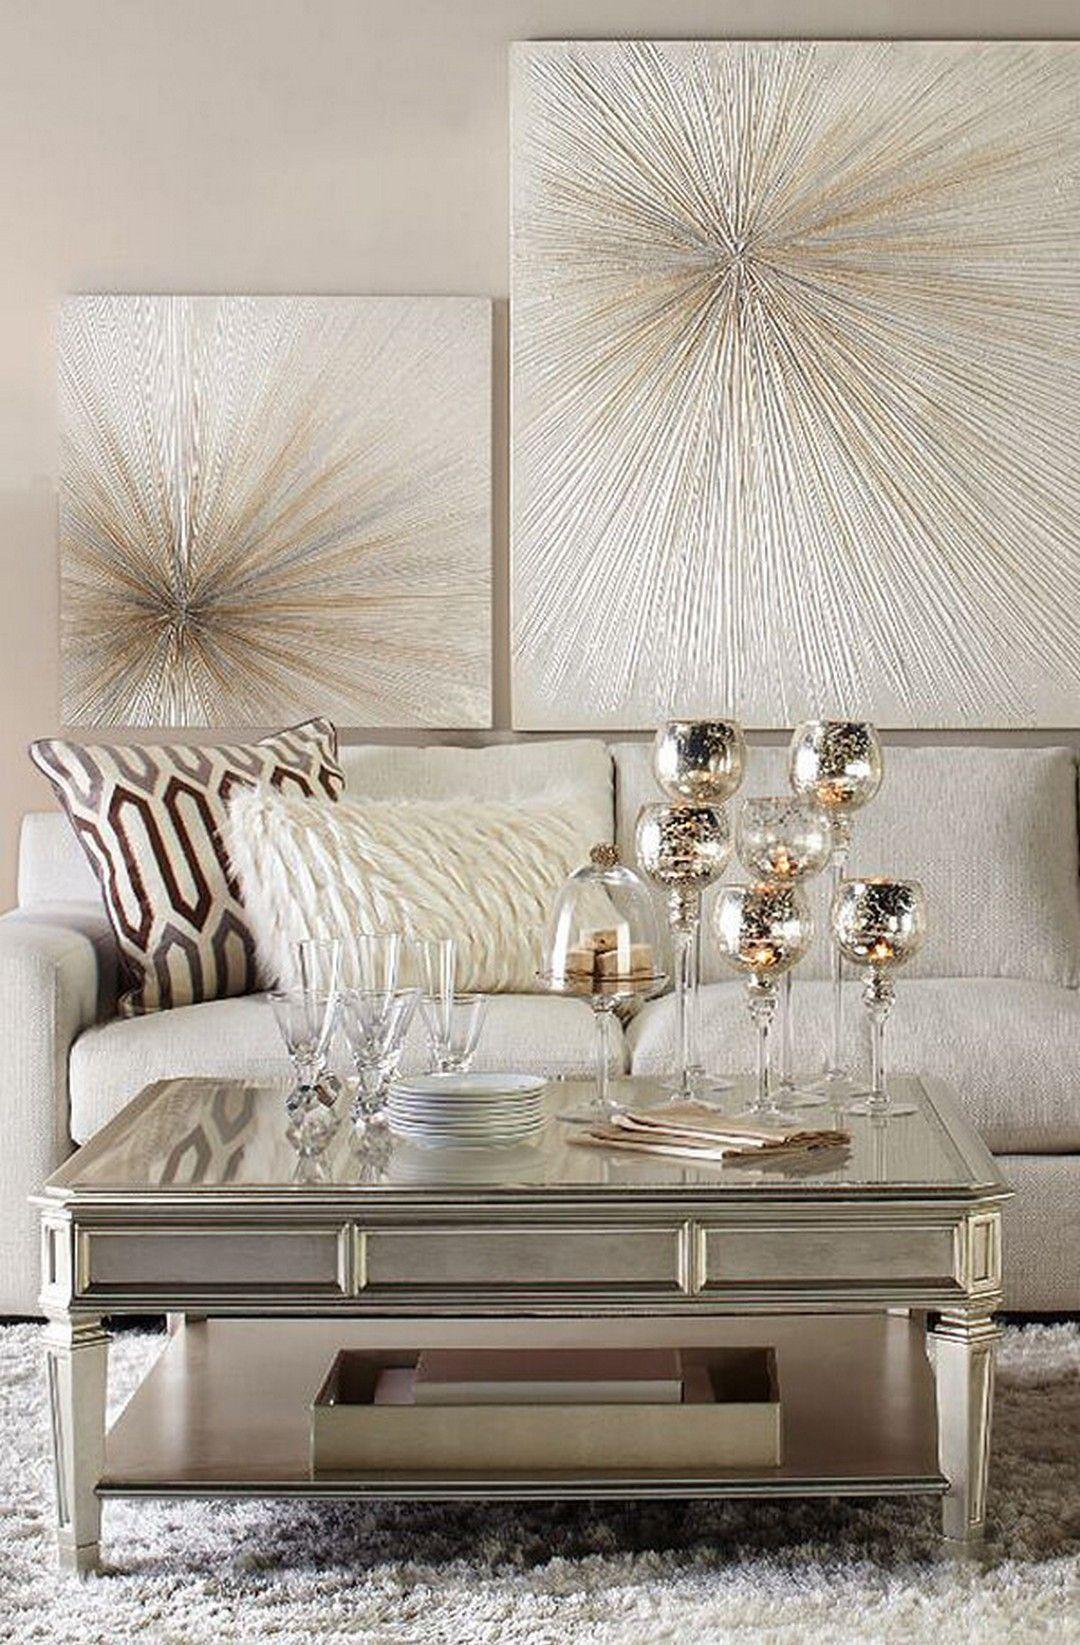 23 Charming Beige Living Room Design Ideas That Will Brighten Up ...